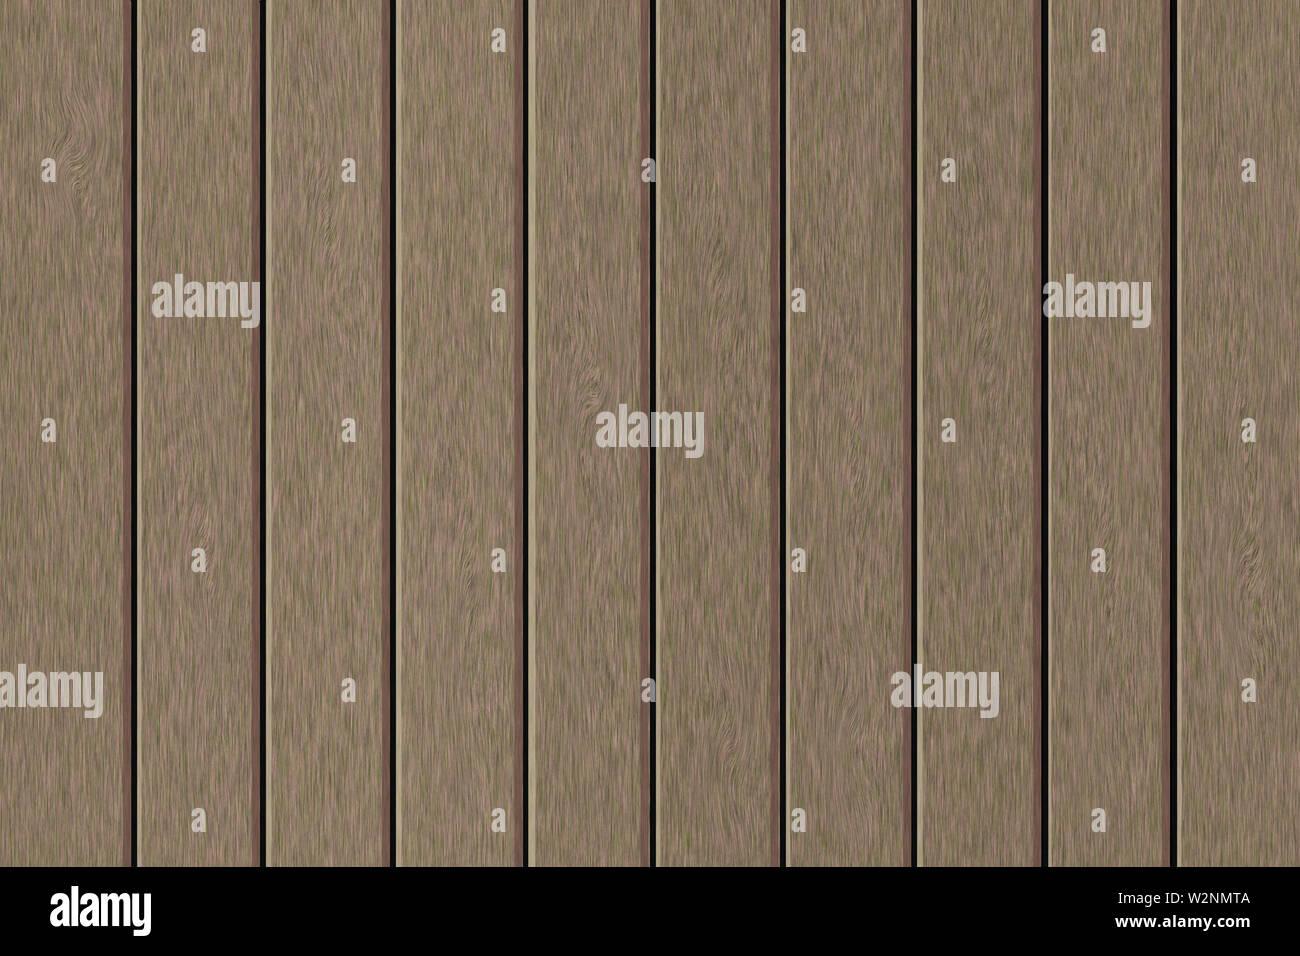 Illustration. Frame filled with imitation of greyish wooden planks. - Stock Image